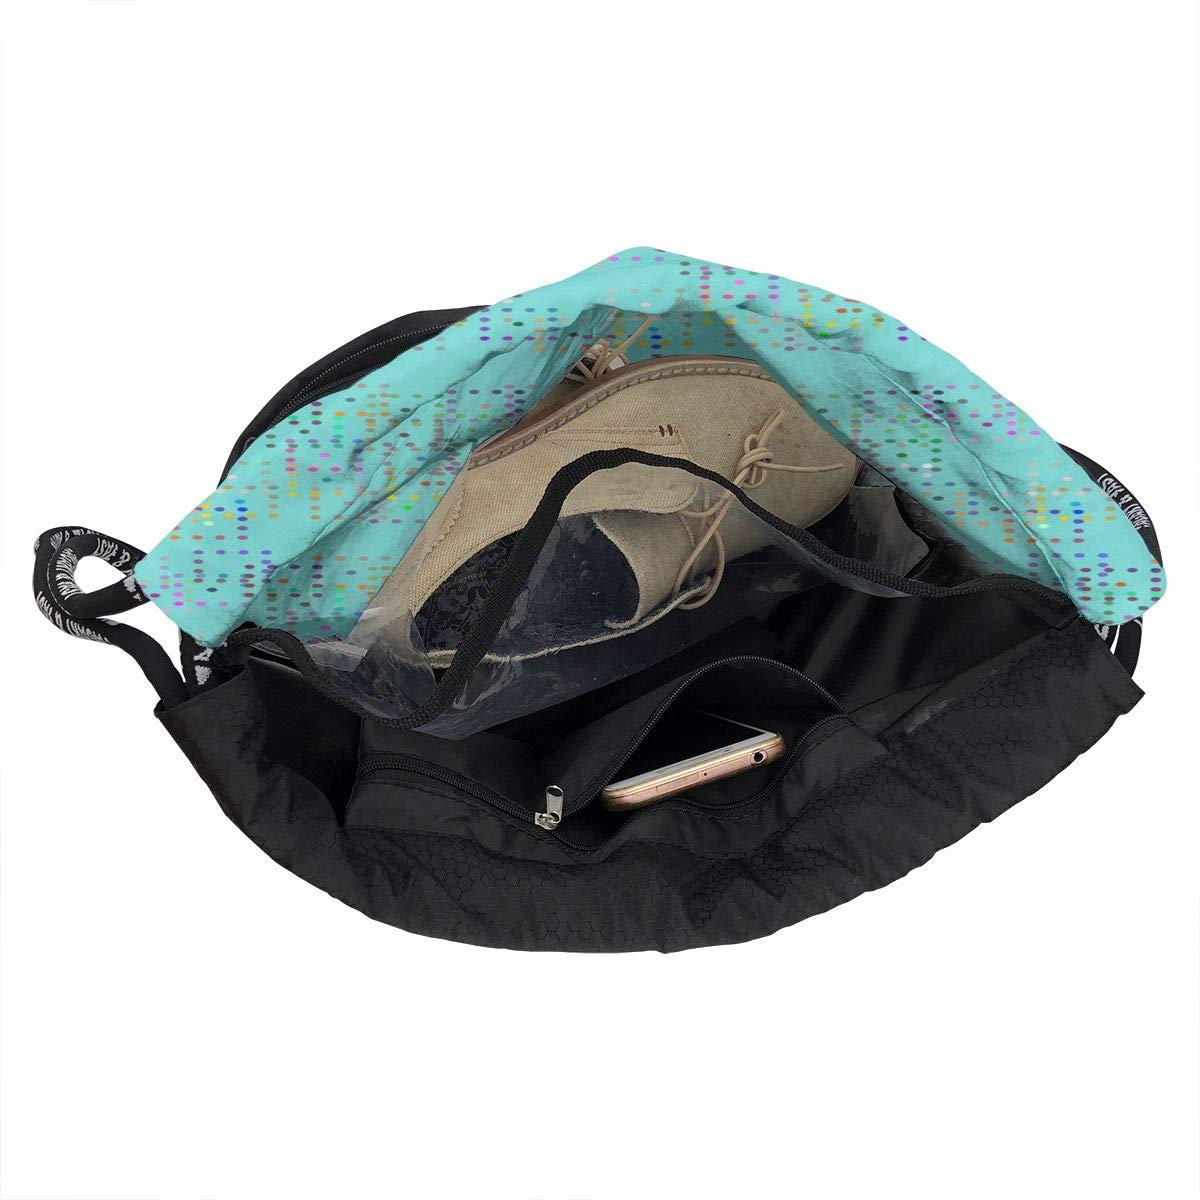 Graded Grains Aqua Drawstring Backpack Sports Athletic Gym Cinch Sack String Storage Bags for Hiking Travel Beach